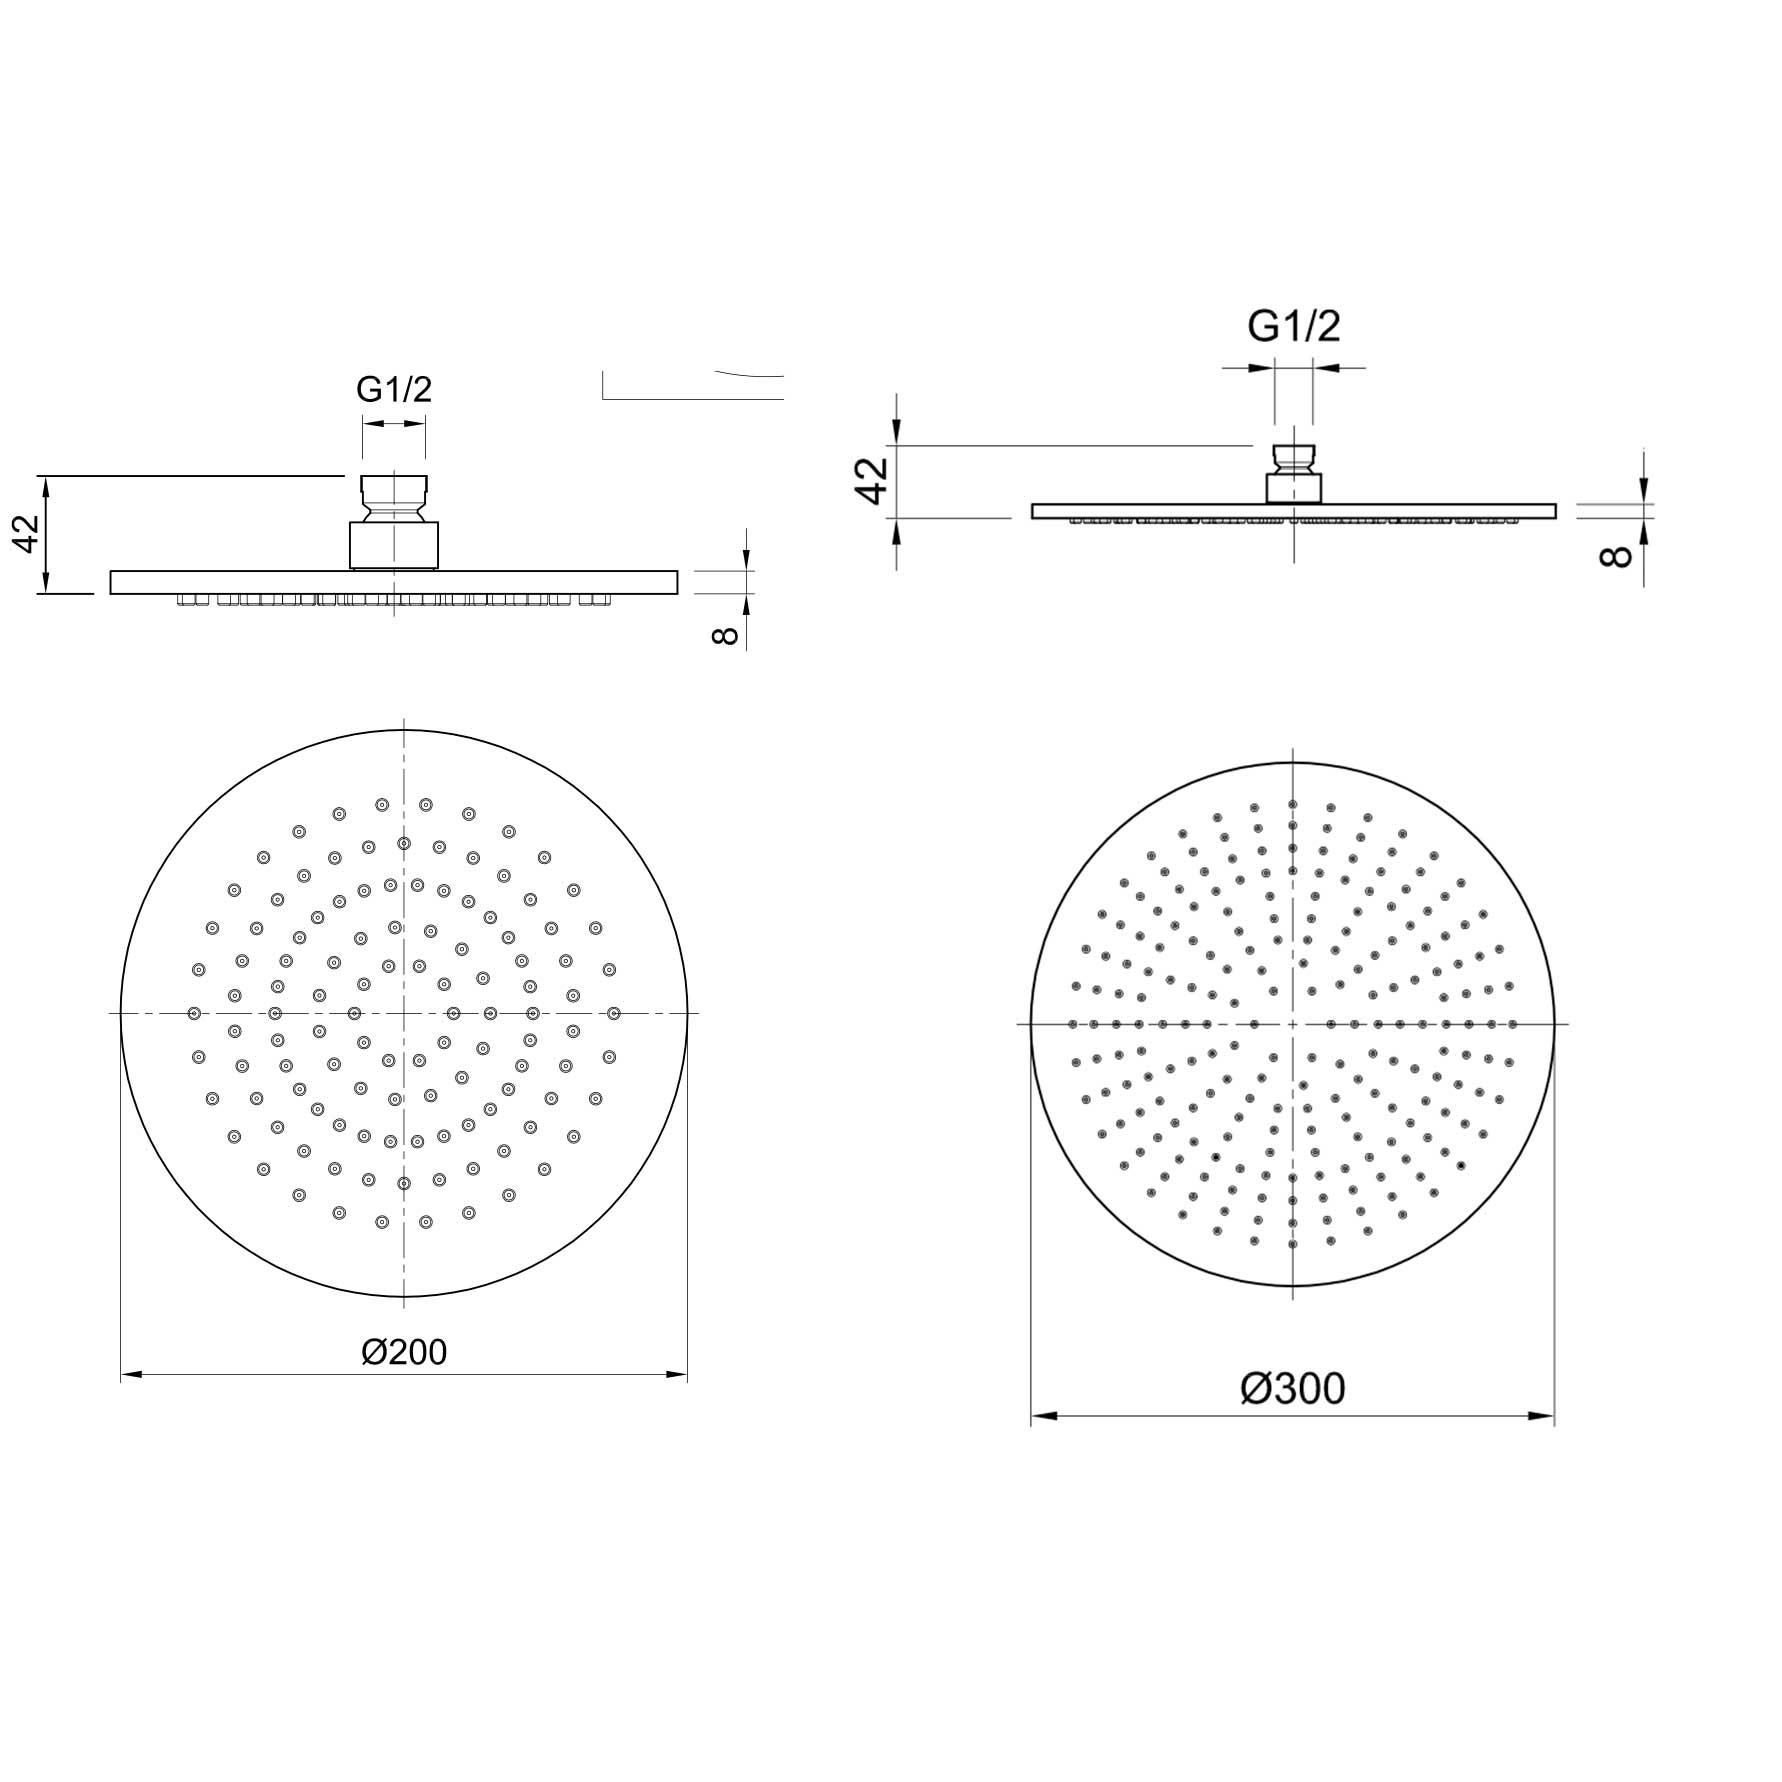 AX949 Shower Head Technicals